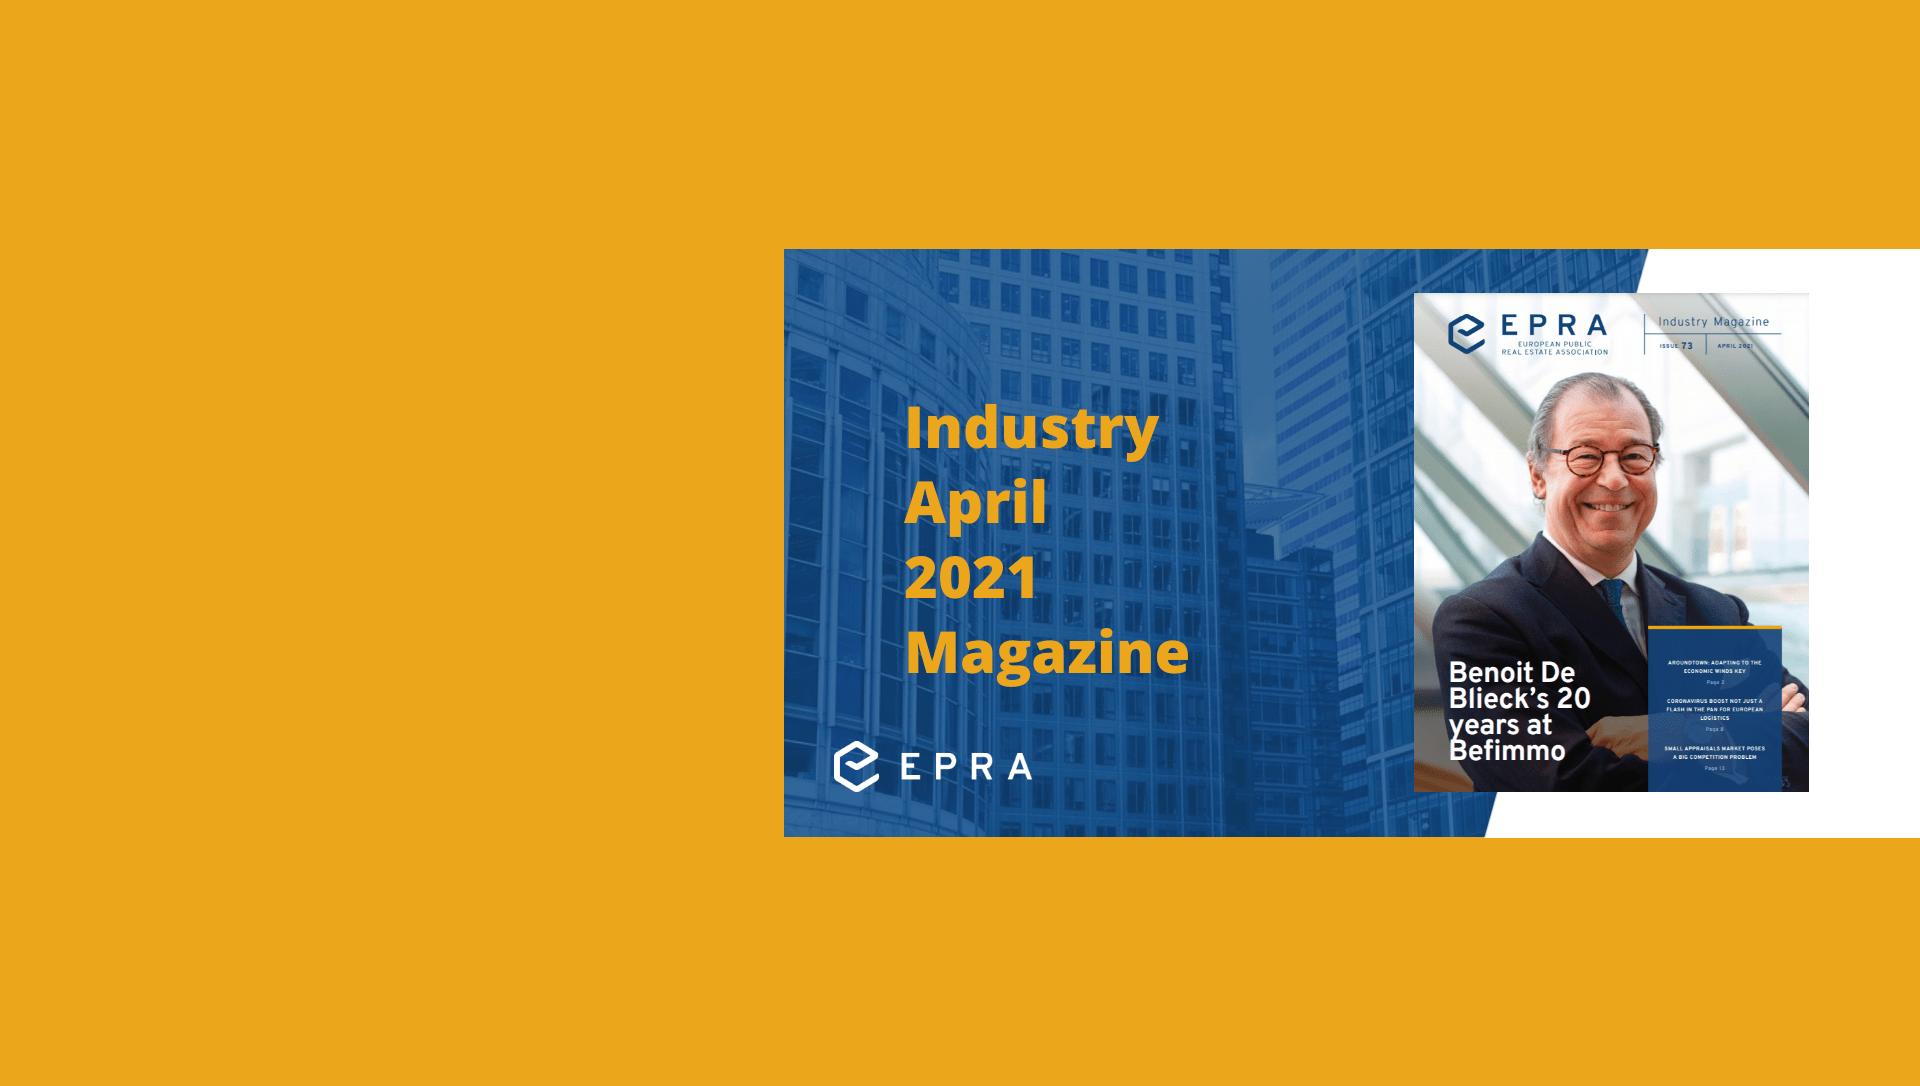 EPRA Magazine April 2021 homepage slider 19201086.png